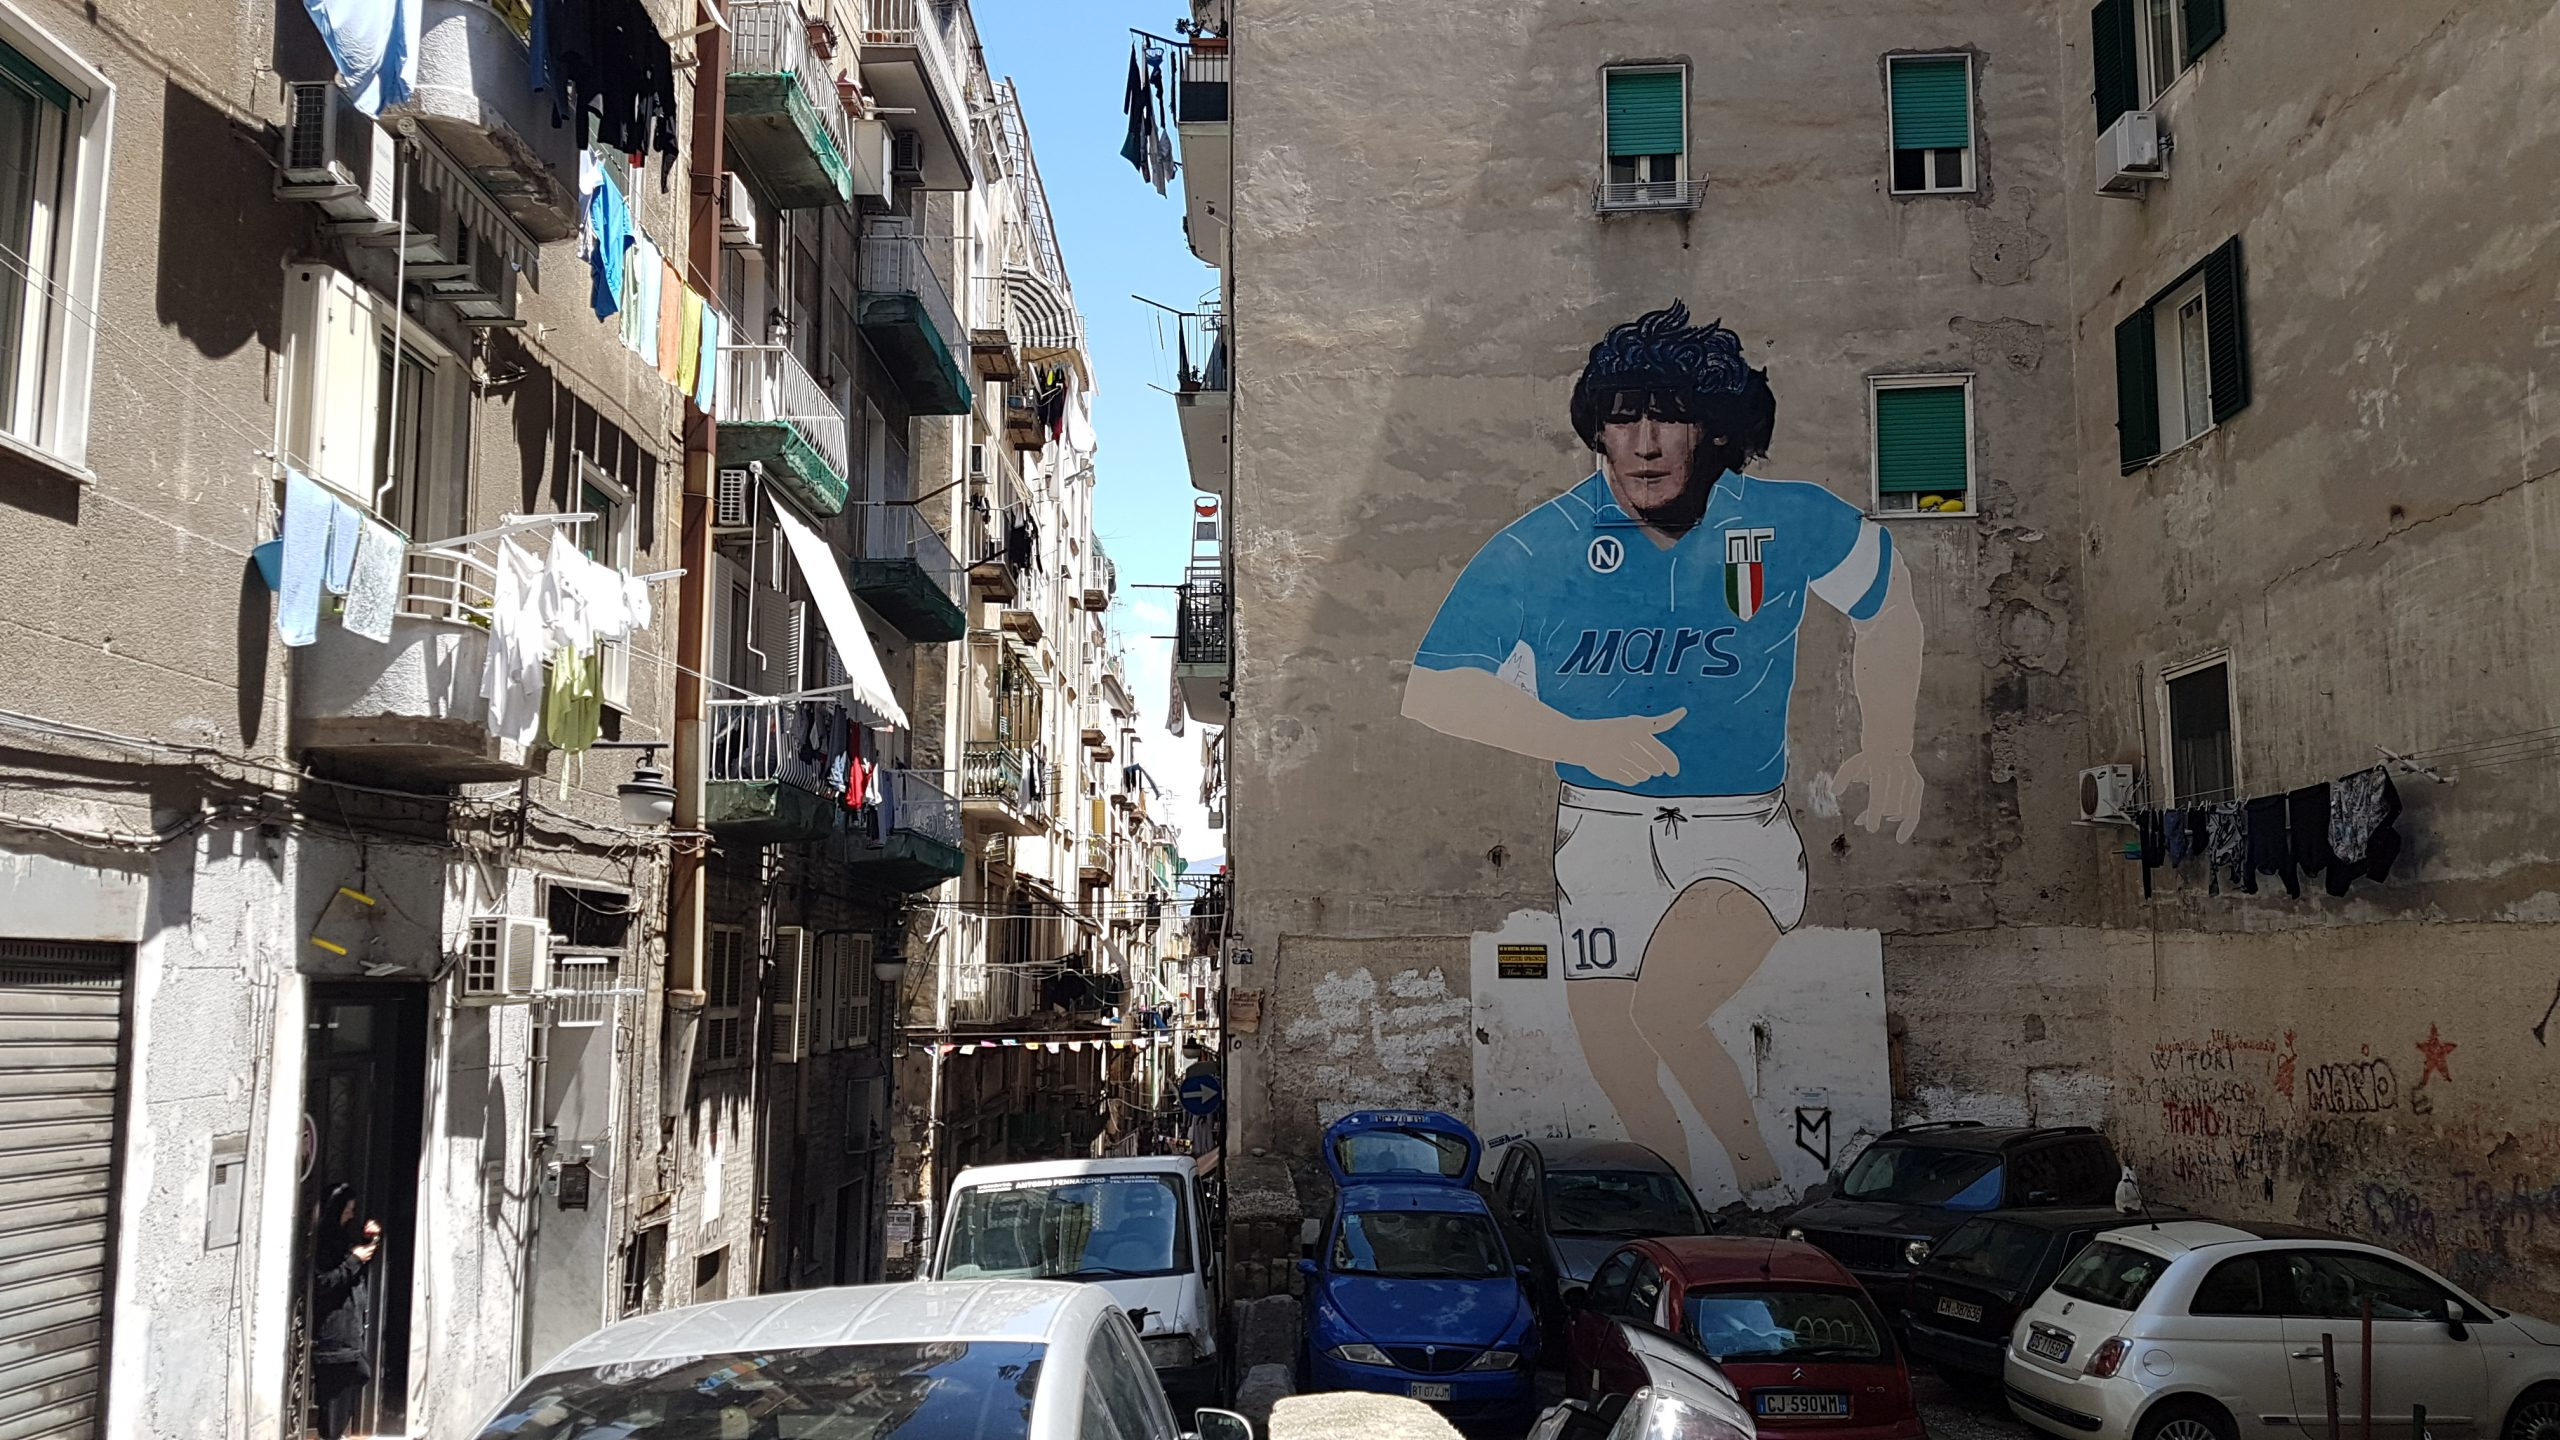 Barcelona-Napoli - Barcelona-Napoli